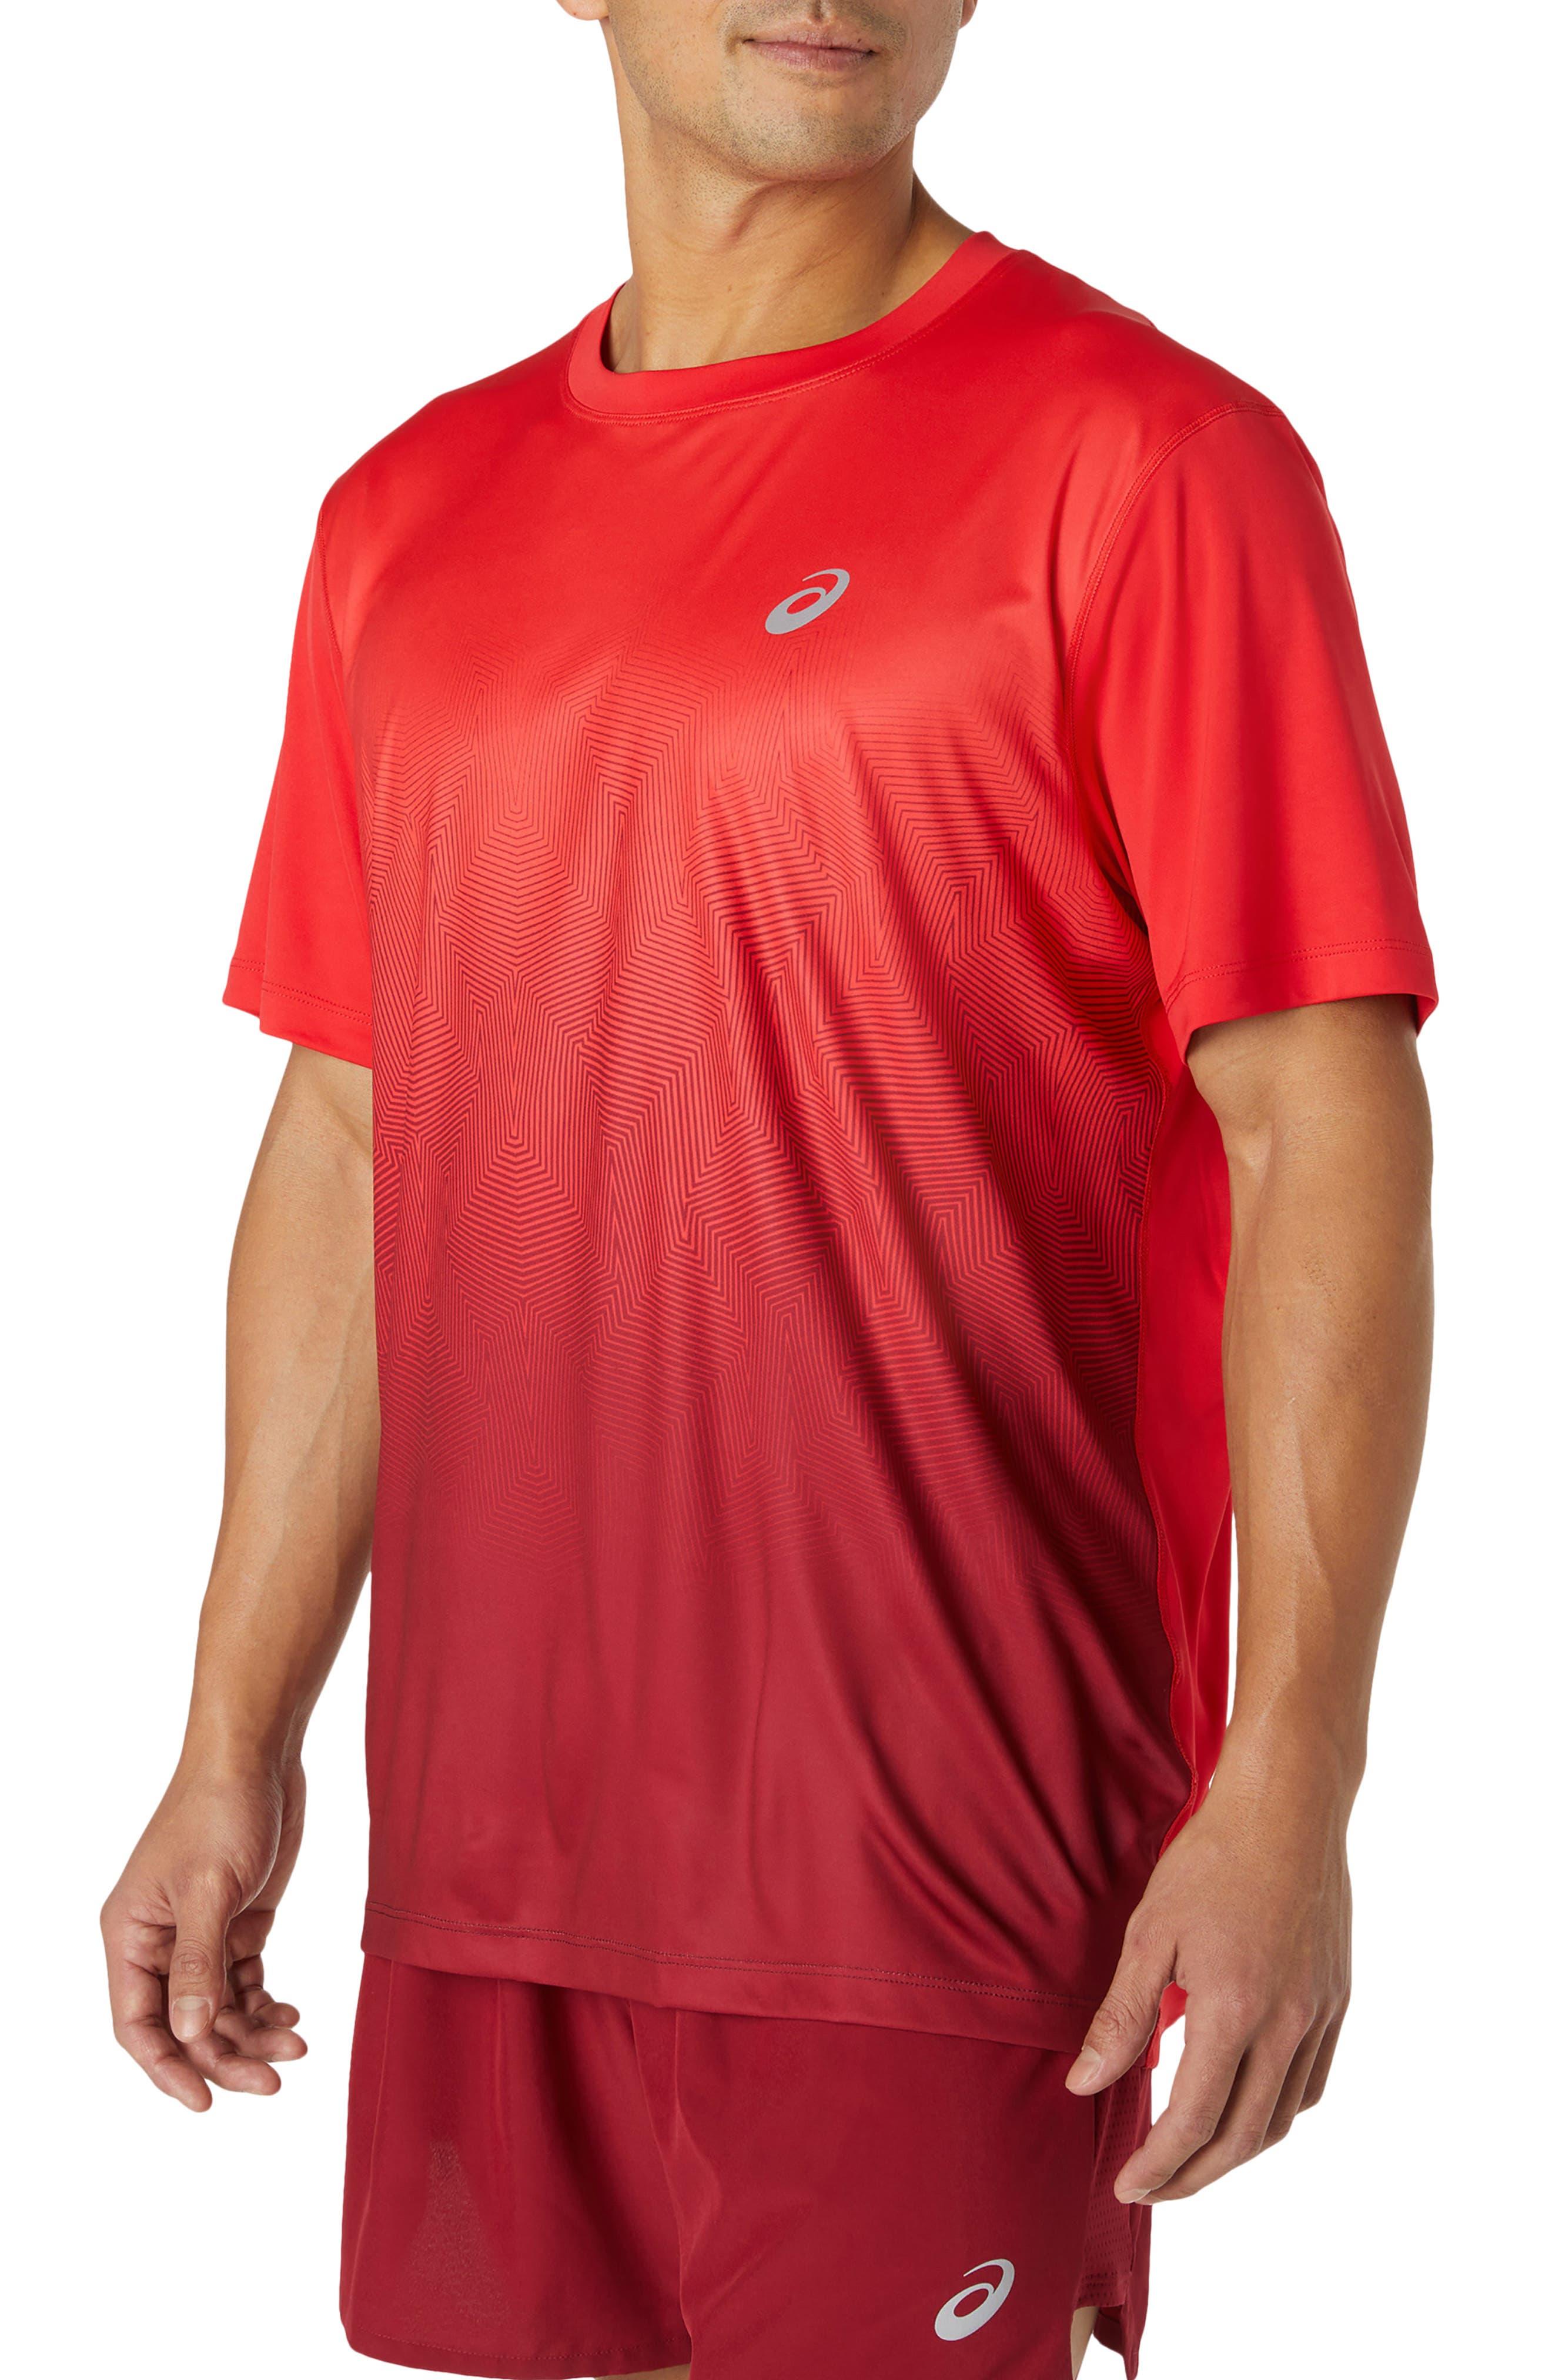 Men's Asics Kasane Ventilated Running T-Shirt